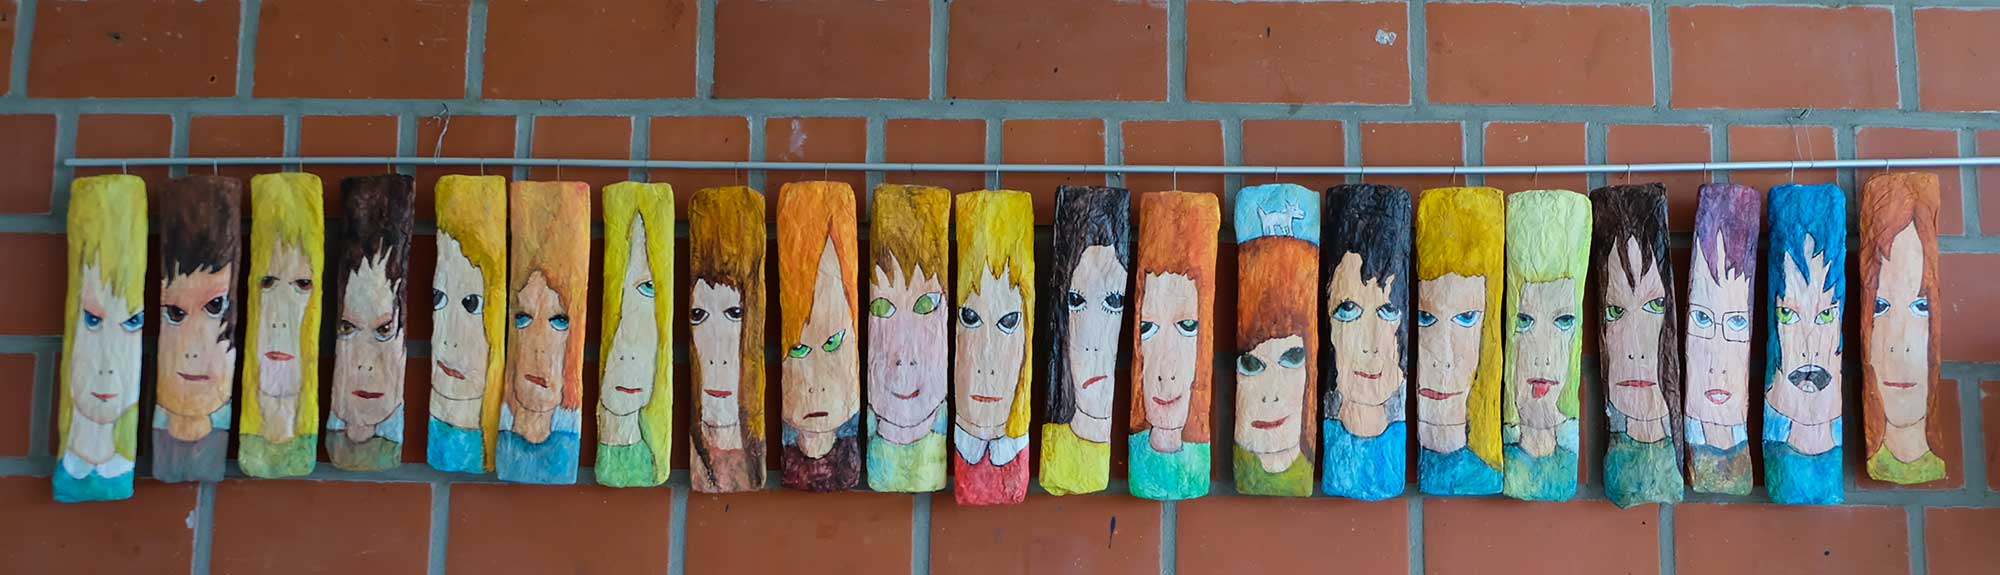 21 Faces